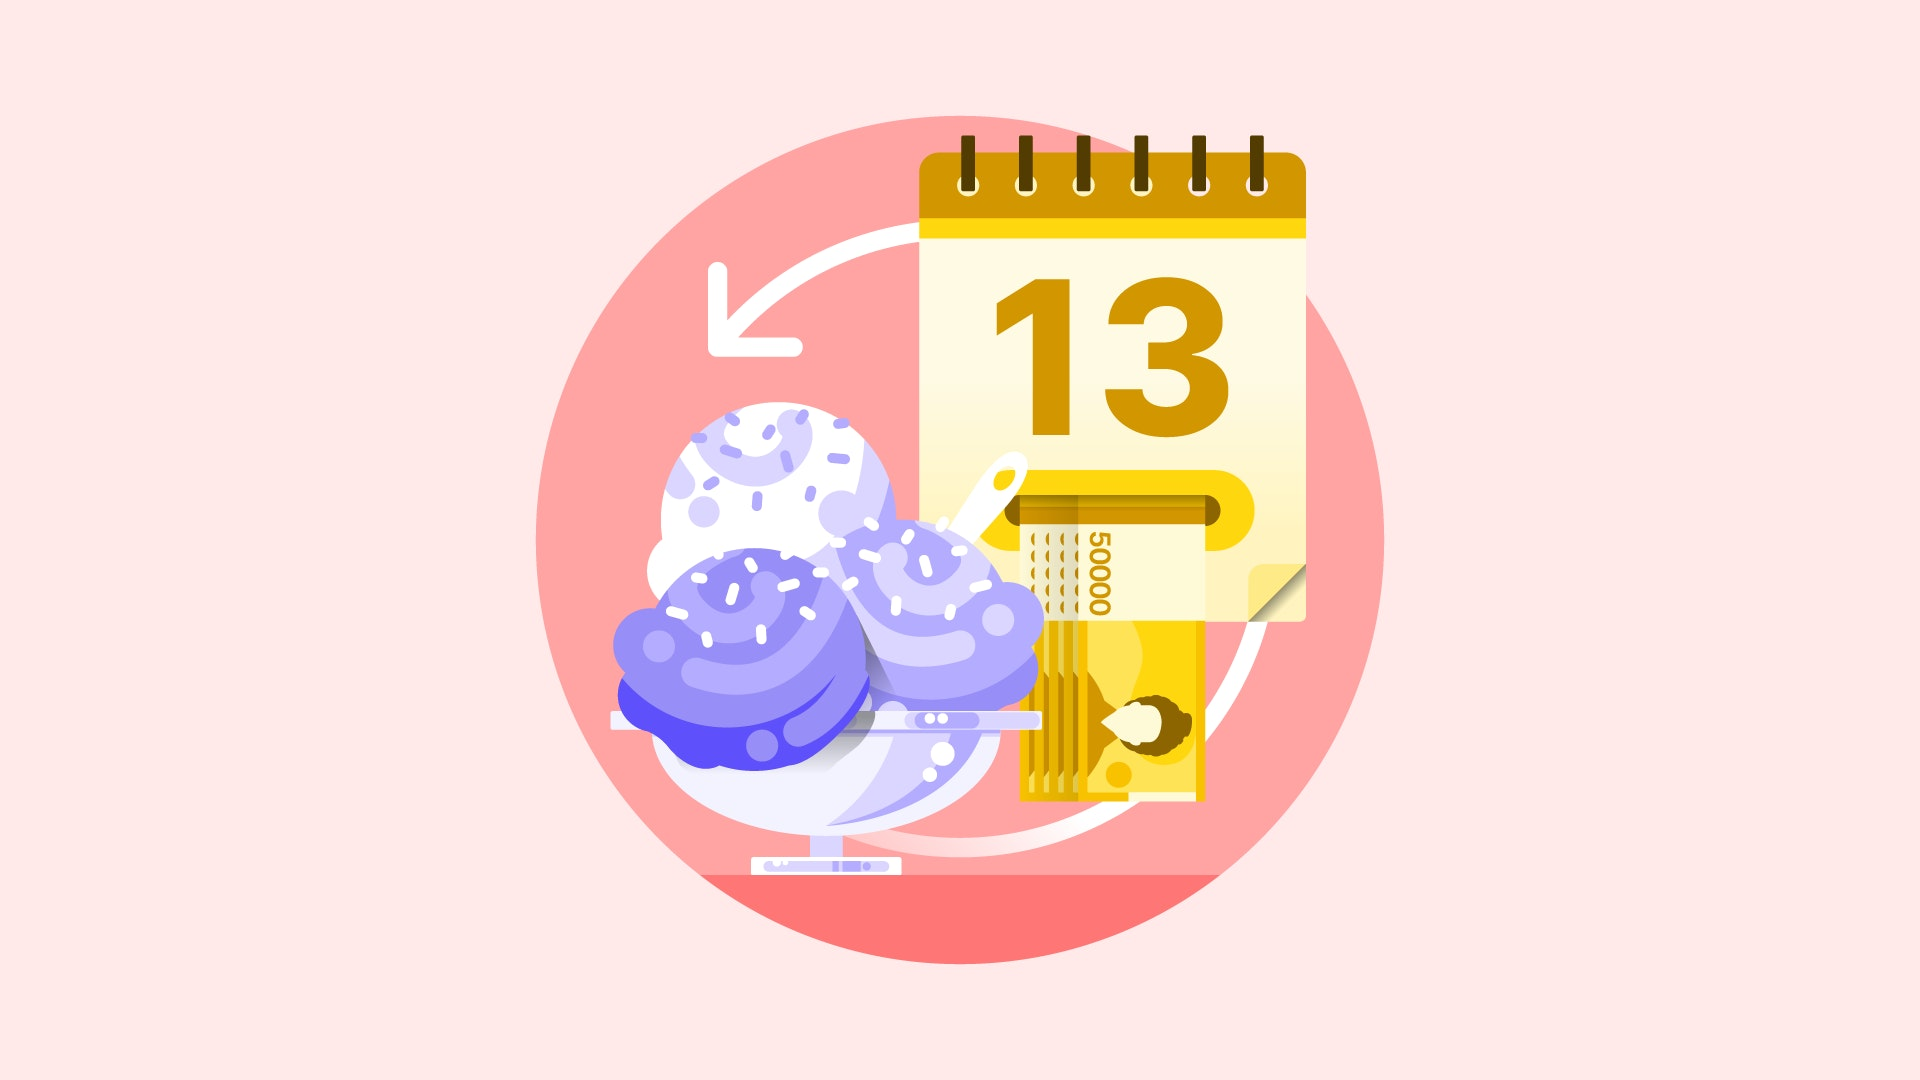 Cover Image for 아이스크림으로 세금 내는 법 ②연말정산